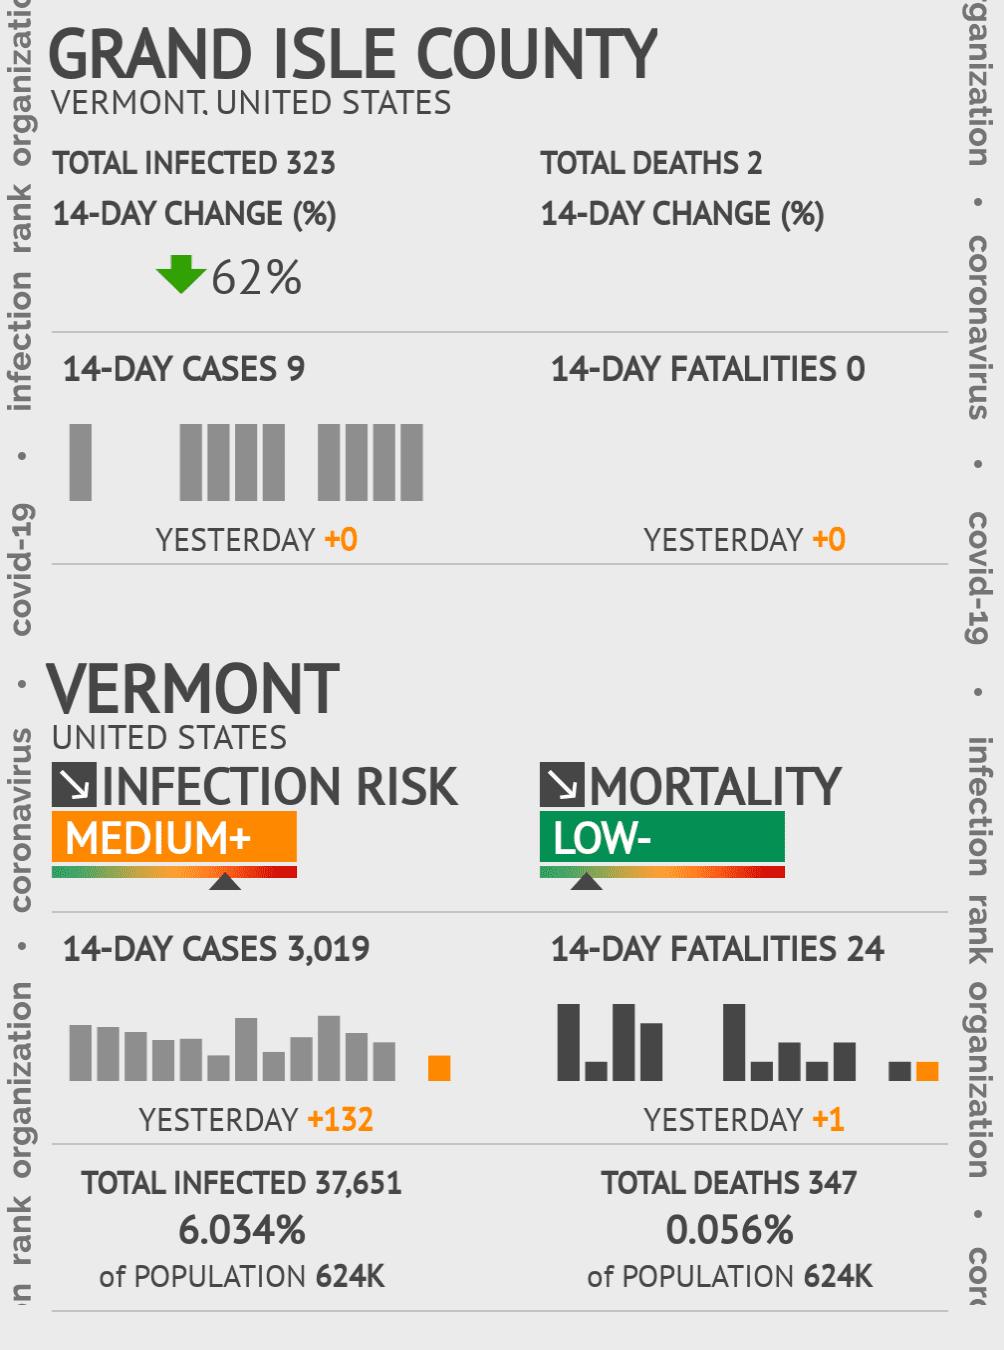 Grand Isle County Coronavirus Covid-19 Risk of Infection on July 24, 2021